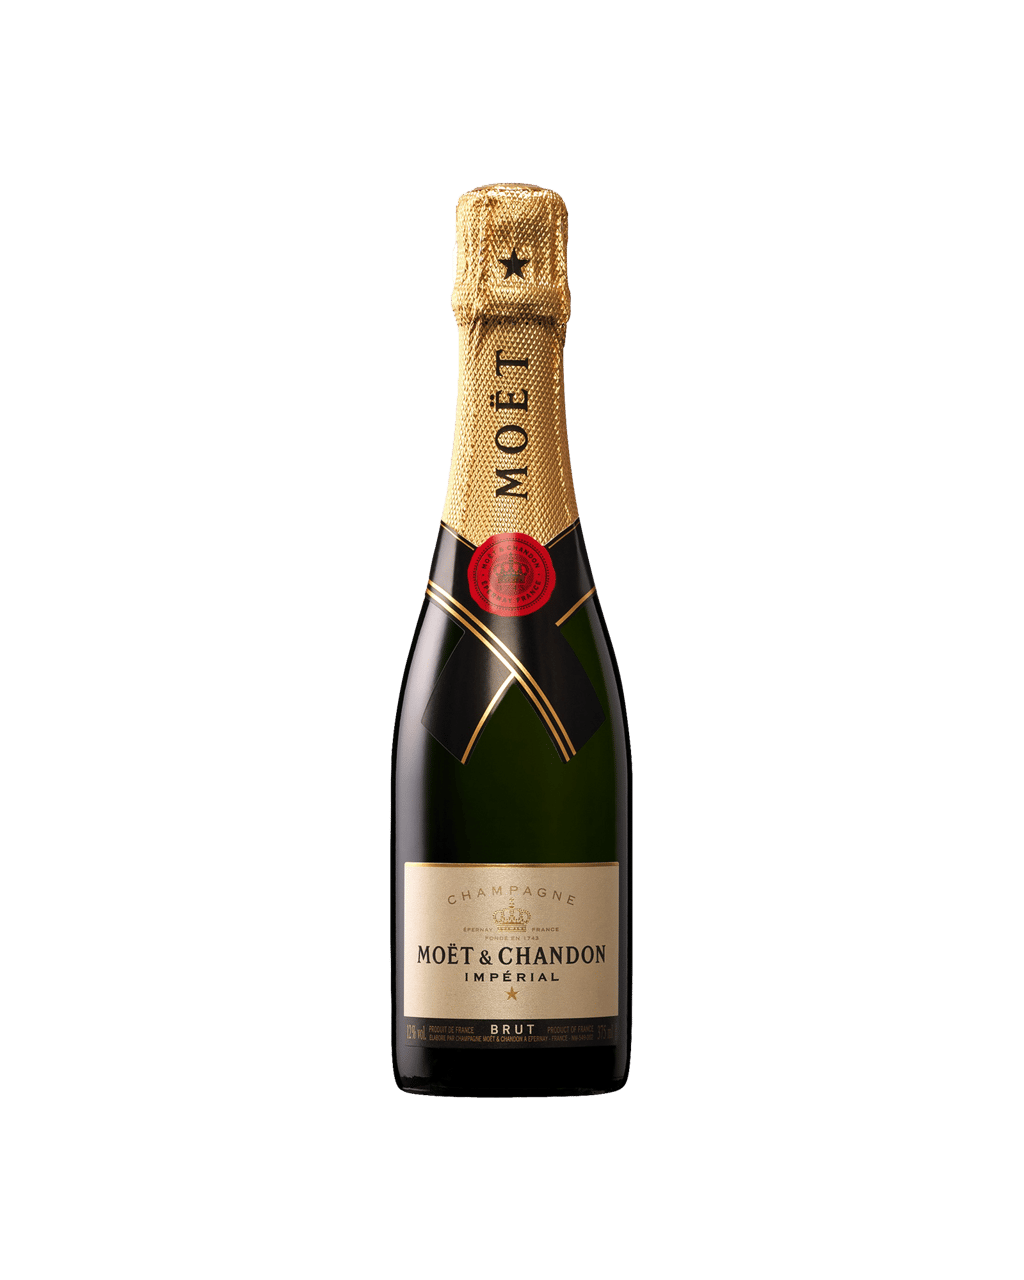 Mot Chandon Brut Imprial 375ml Dan Murphys Buy Wine Bott Funko Pop Coc Howard The Duck 6 Champagne Beer Spirits Online